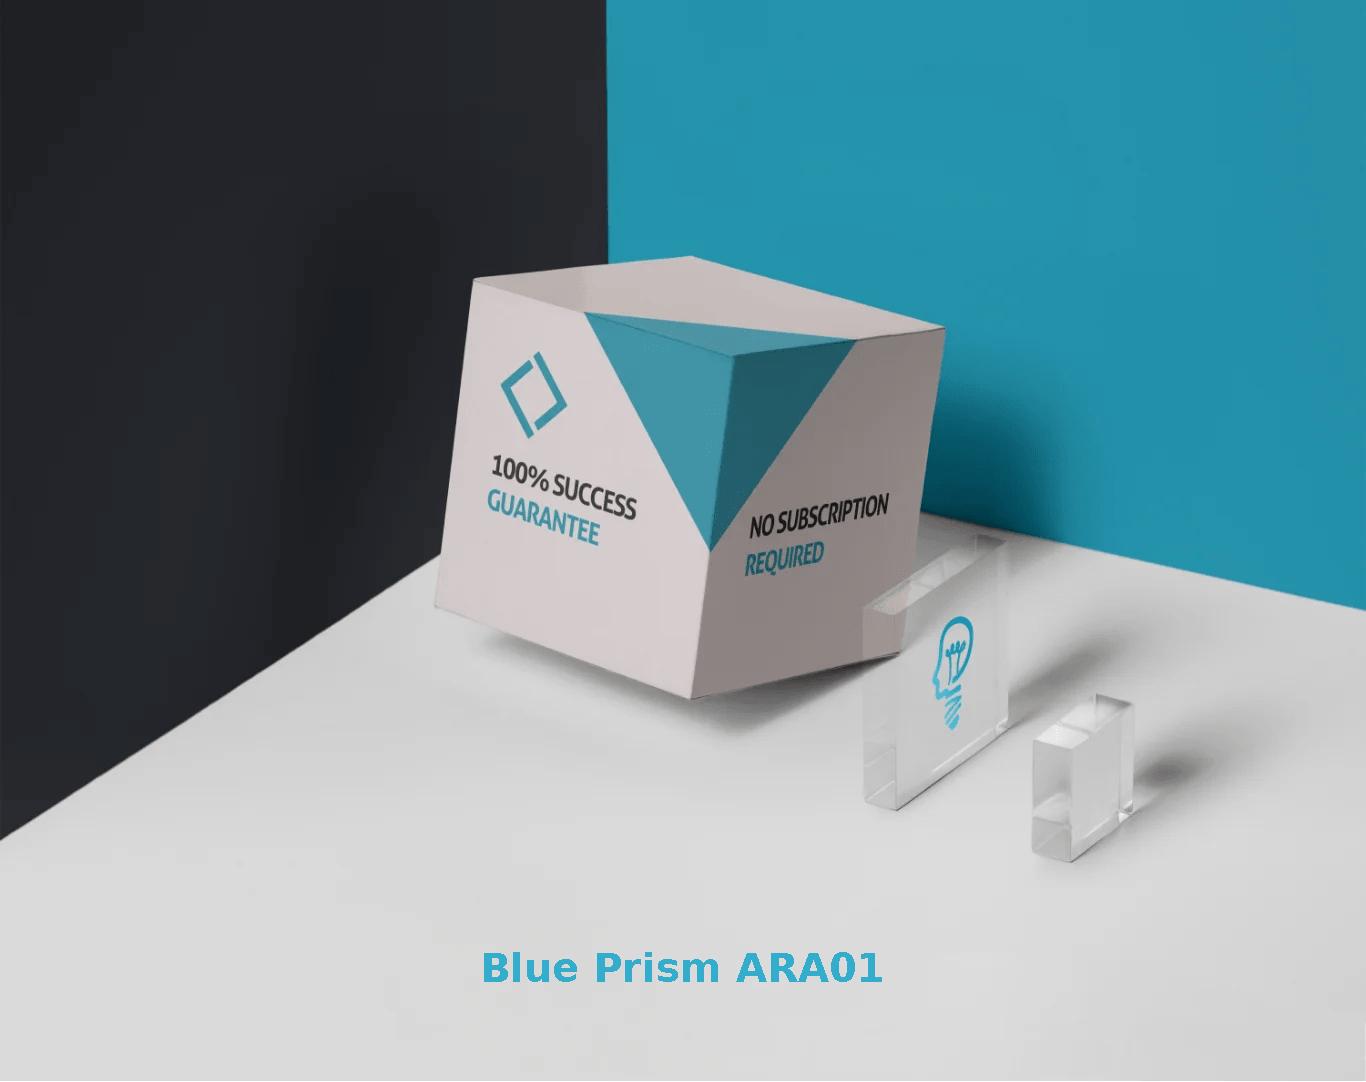 Blue Prism ARA01 Exams